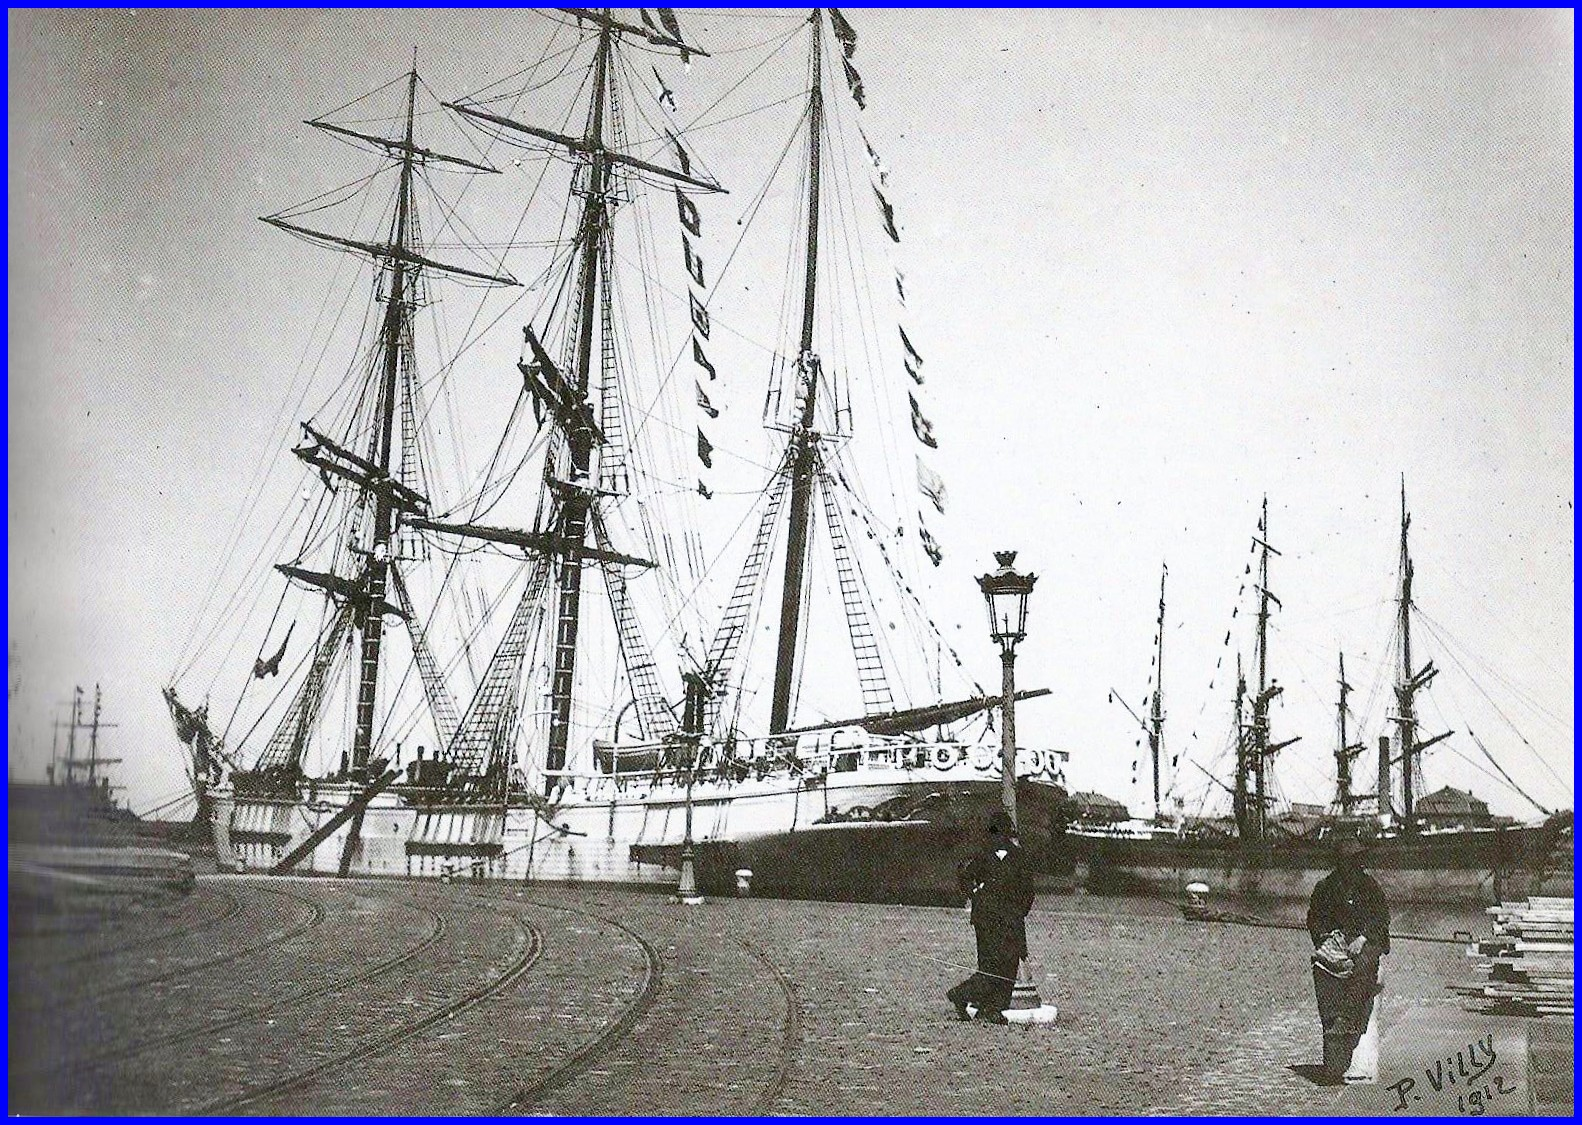 Calais trois mats barque en bois 1912 encadre